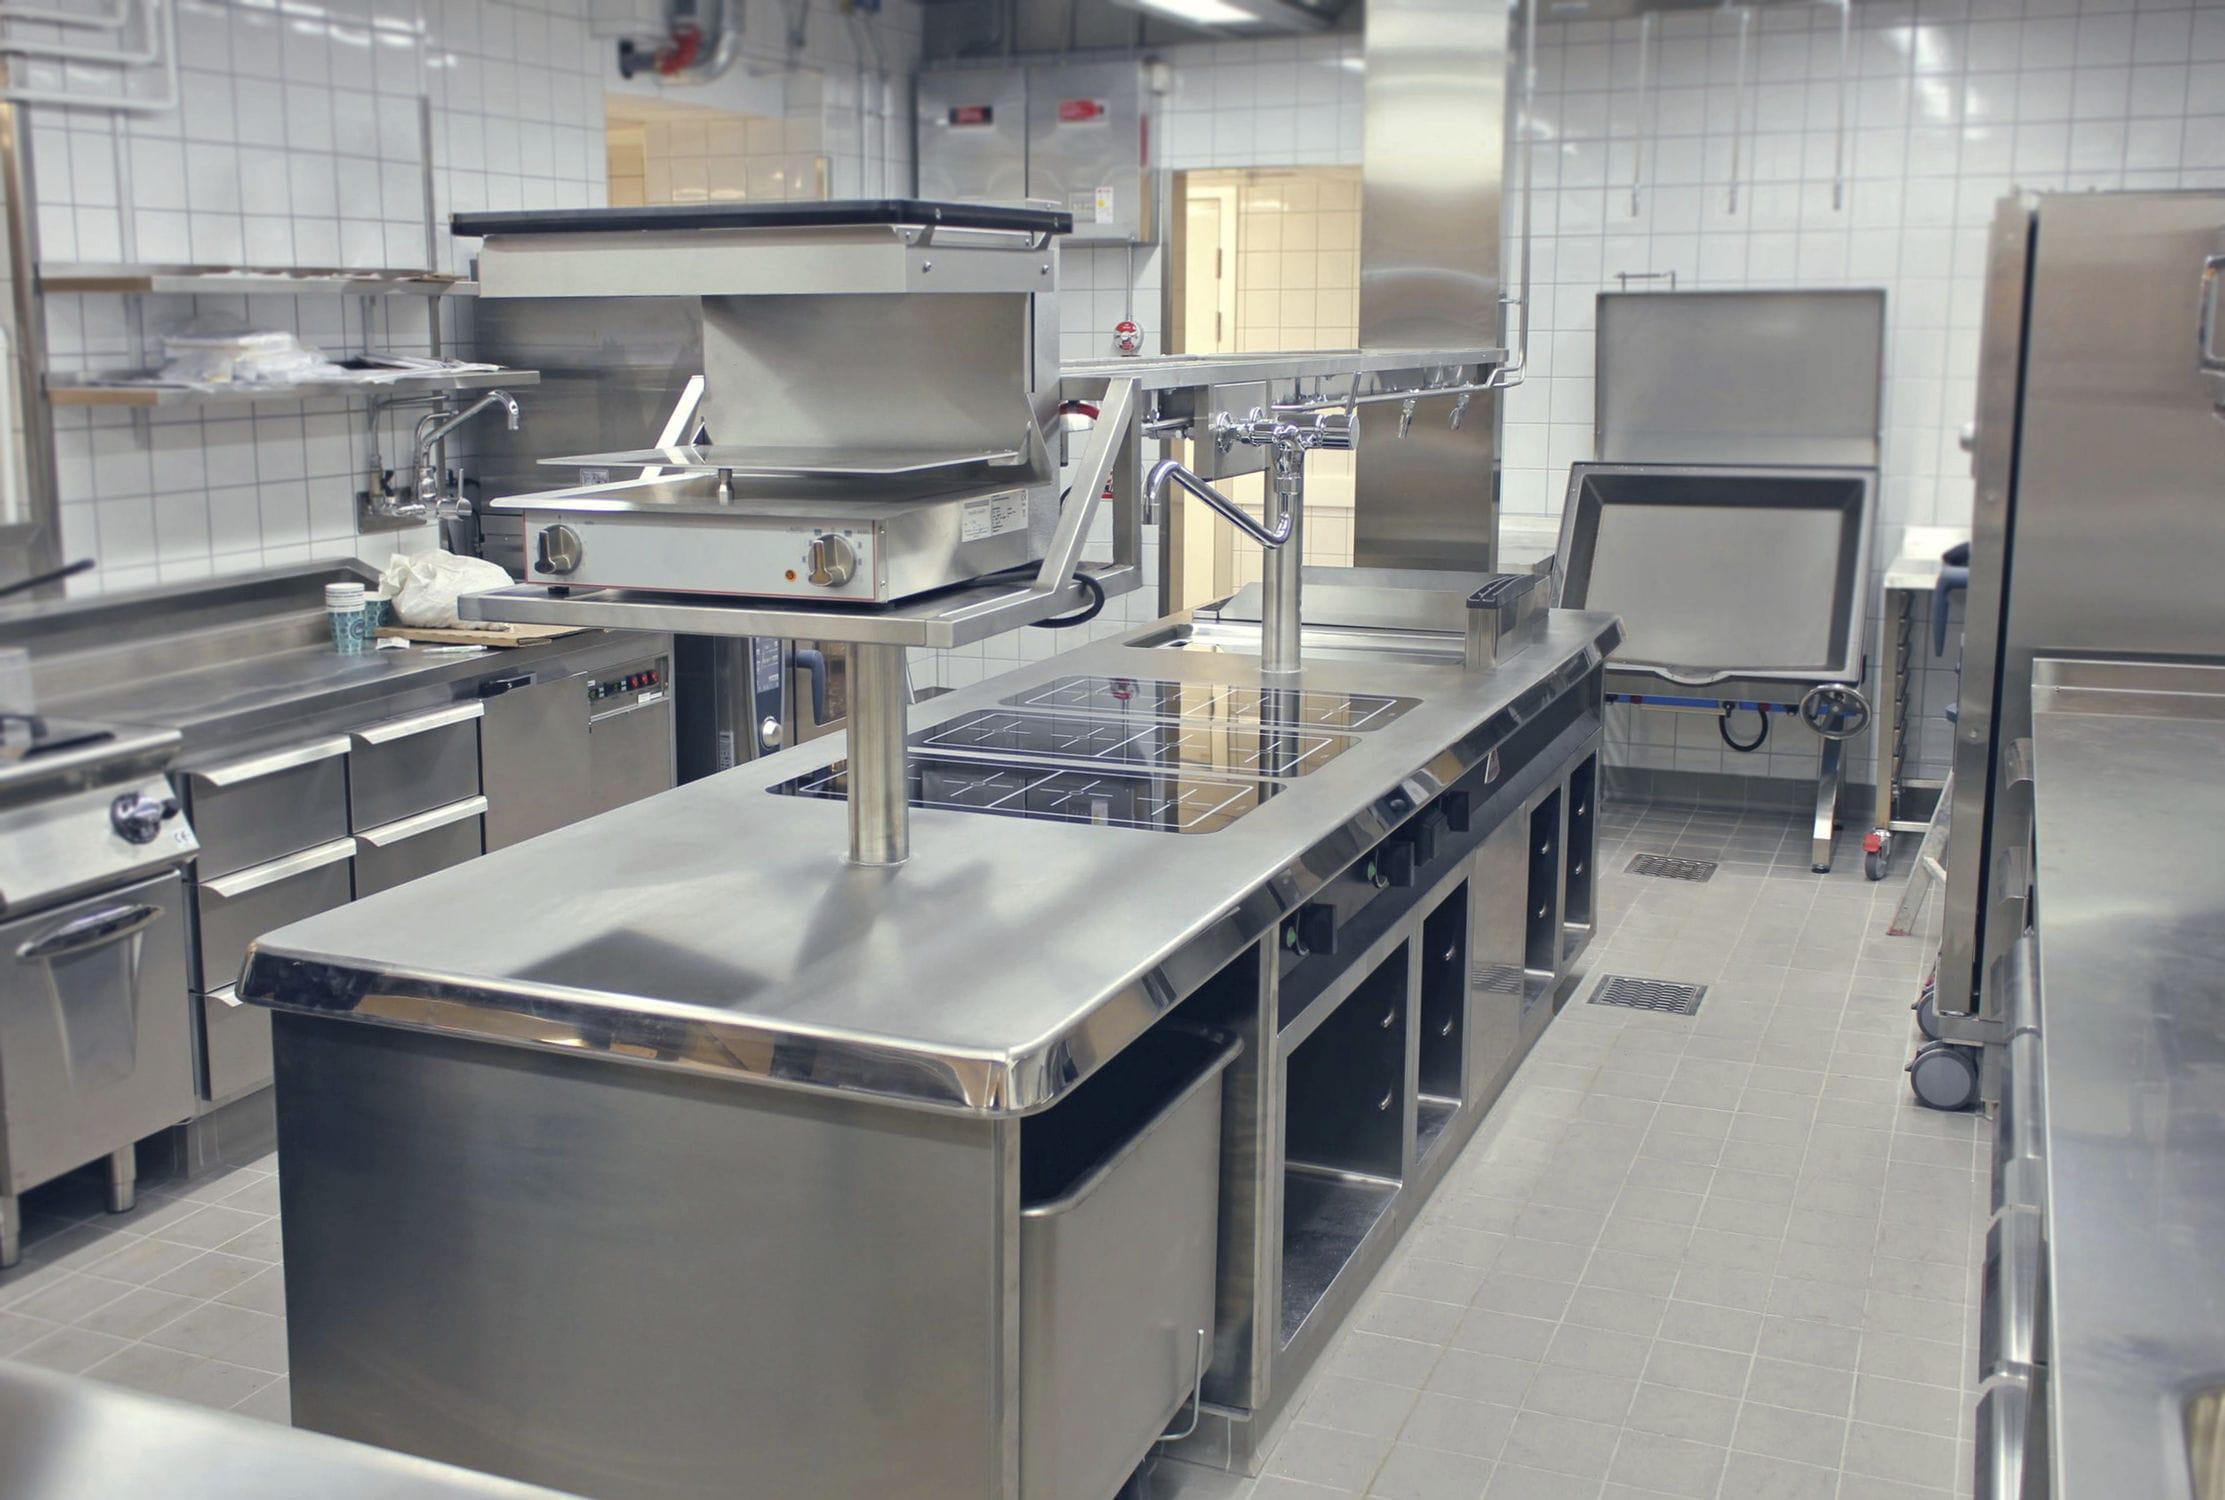 68812 8755014 jessy trade - Cucine industriali per casa ...